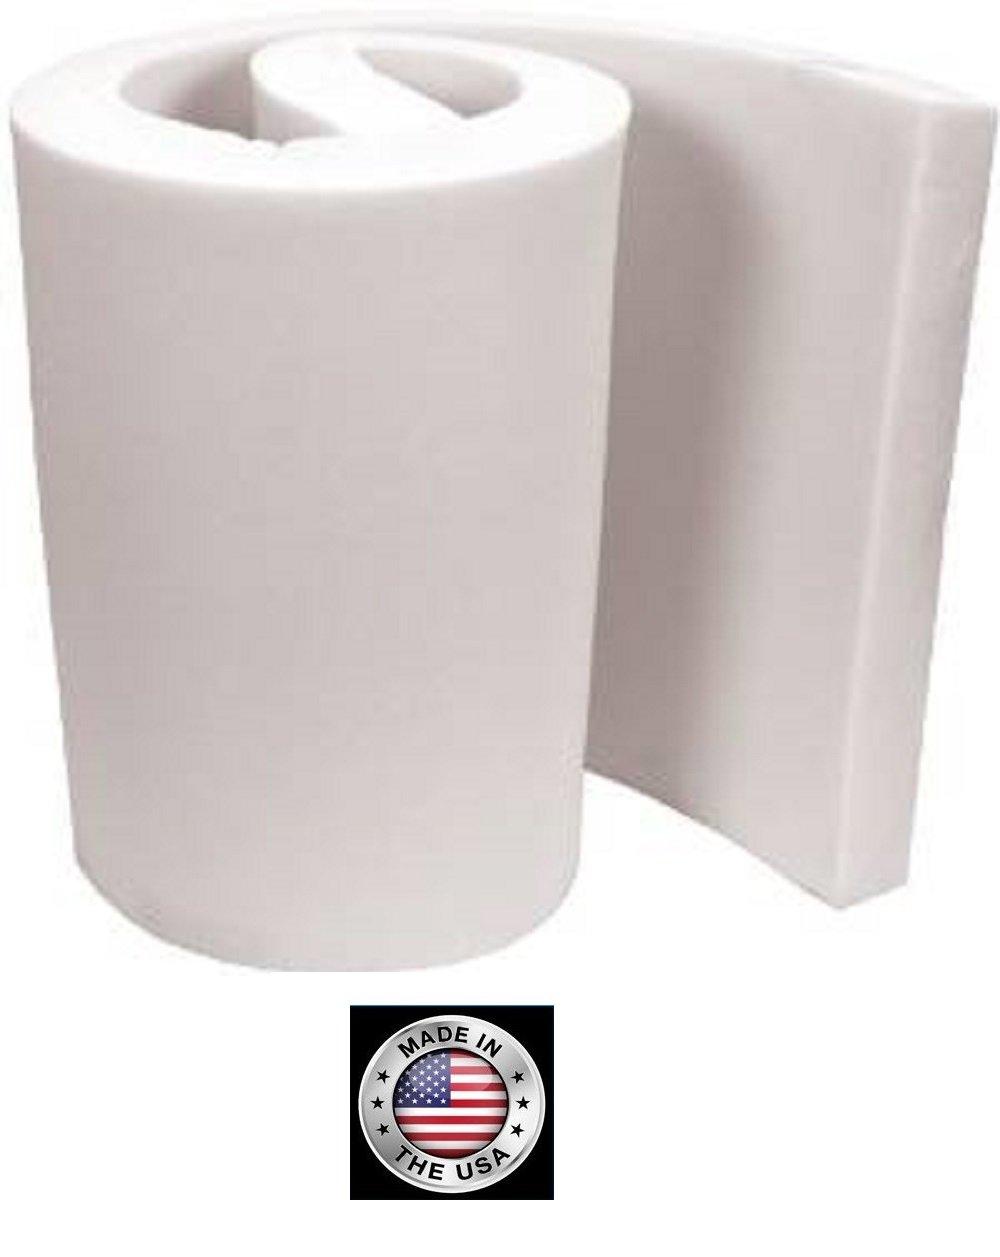 FoamTouch Upholstery Foam Cushion, 3'' L x 30'' W x 72'' H, High Density